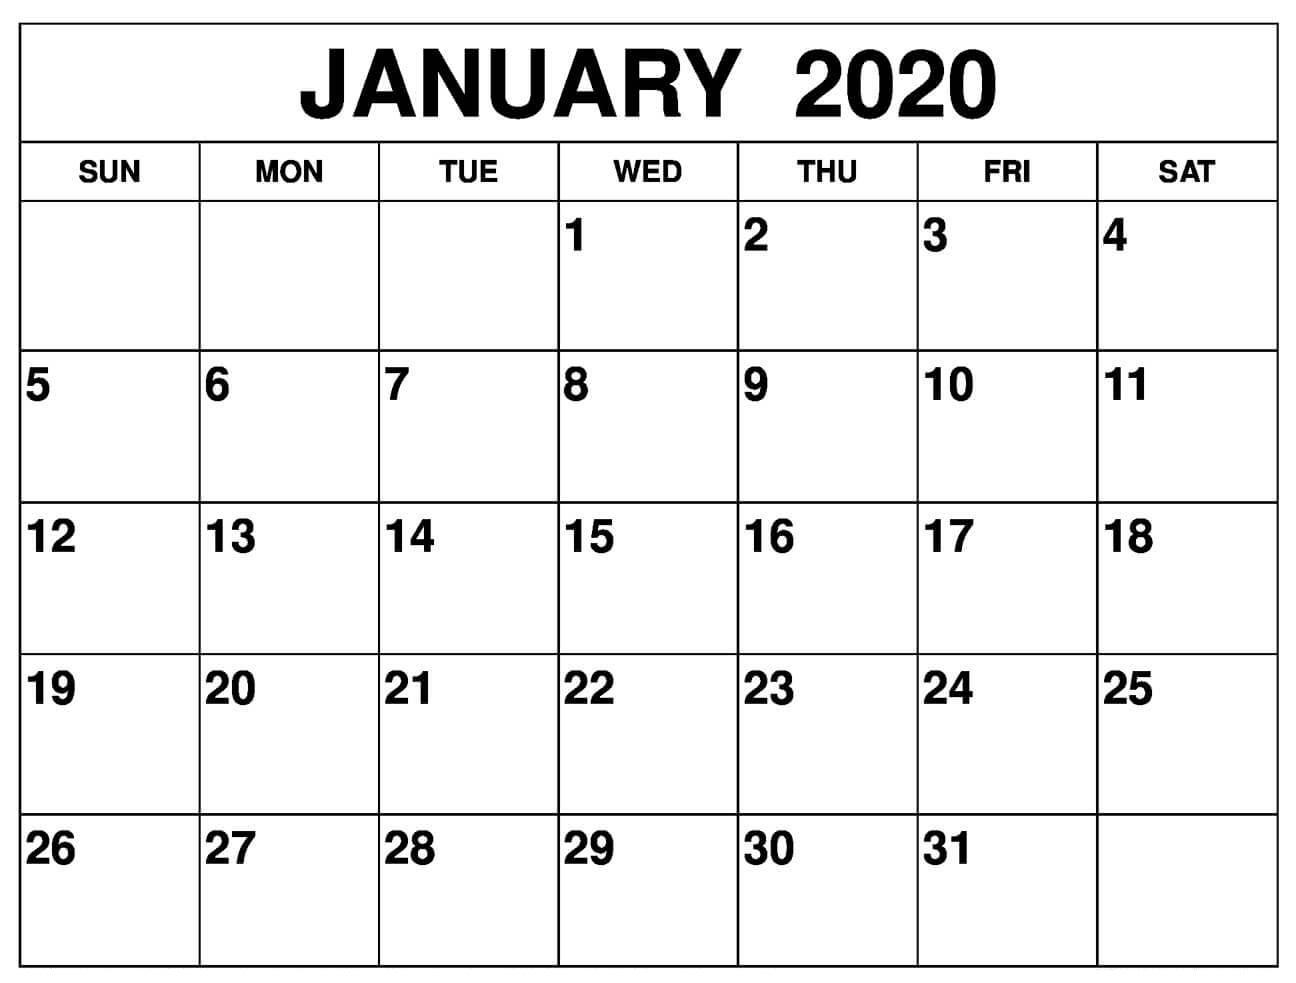 Online January 2020 Calendar Uk Holidays - 2019 Calendars